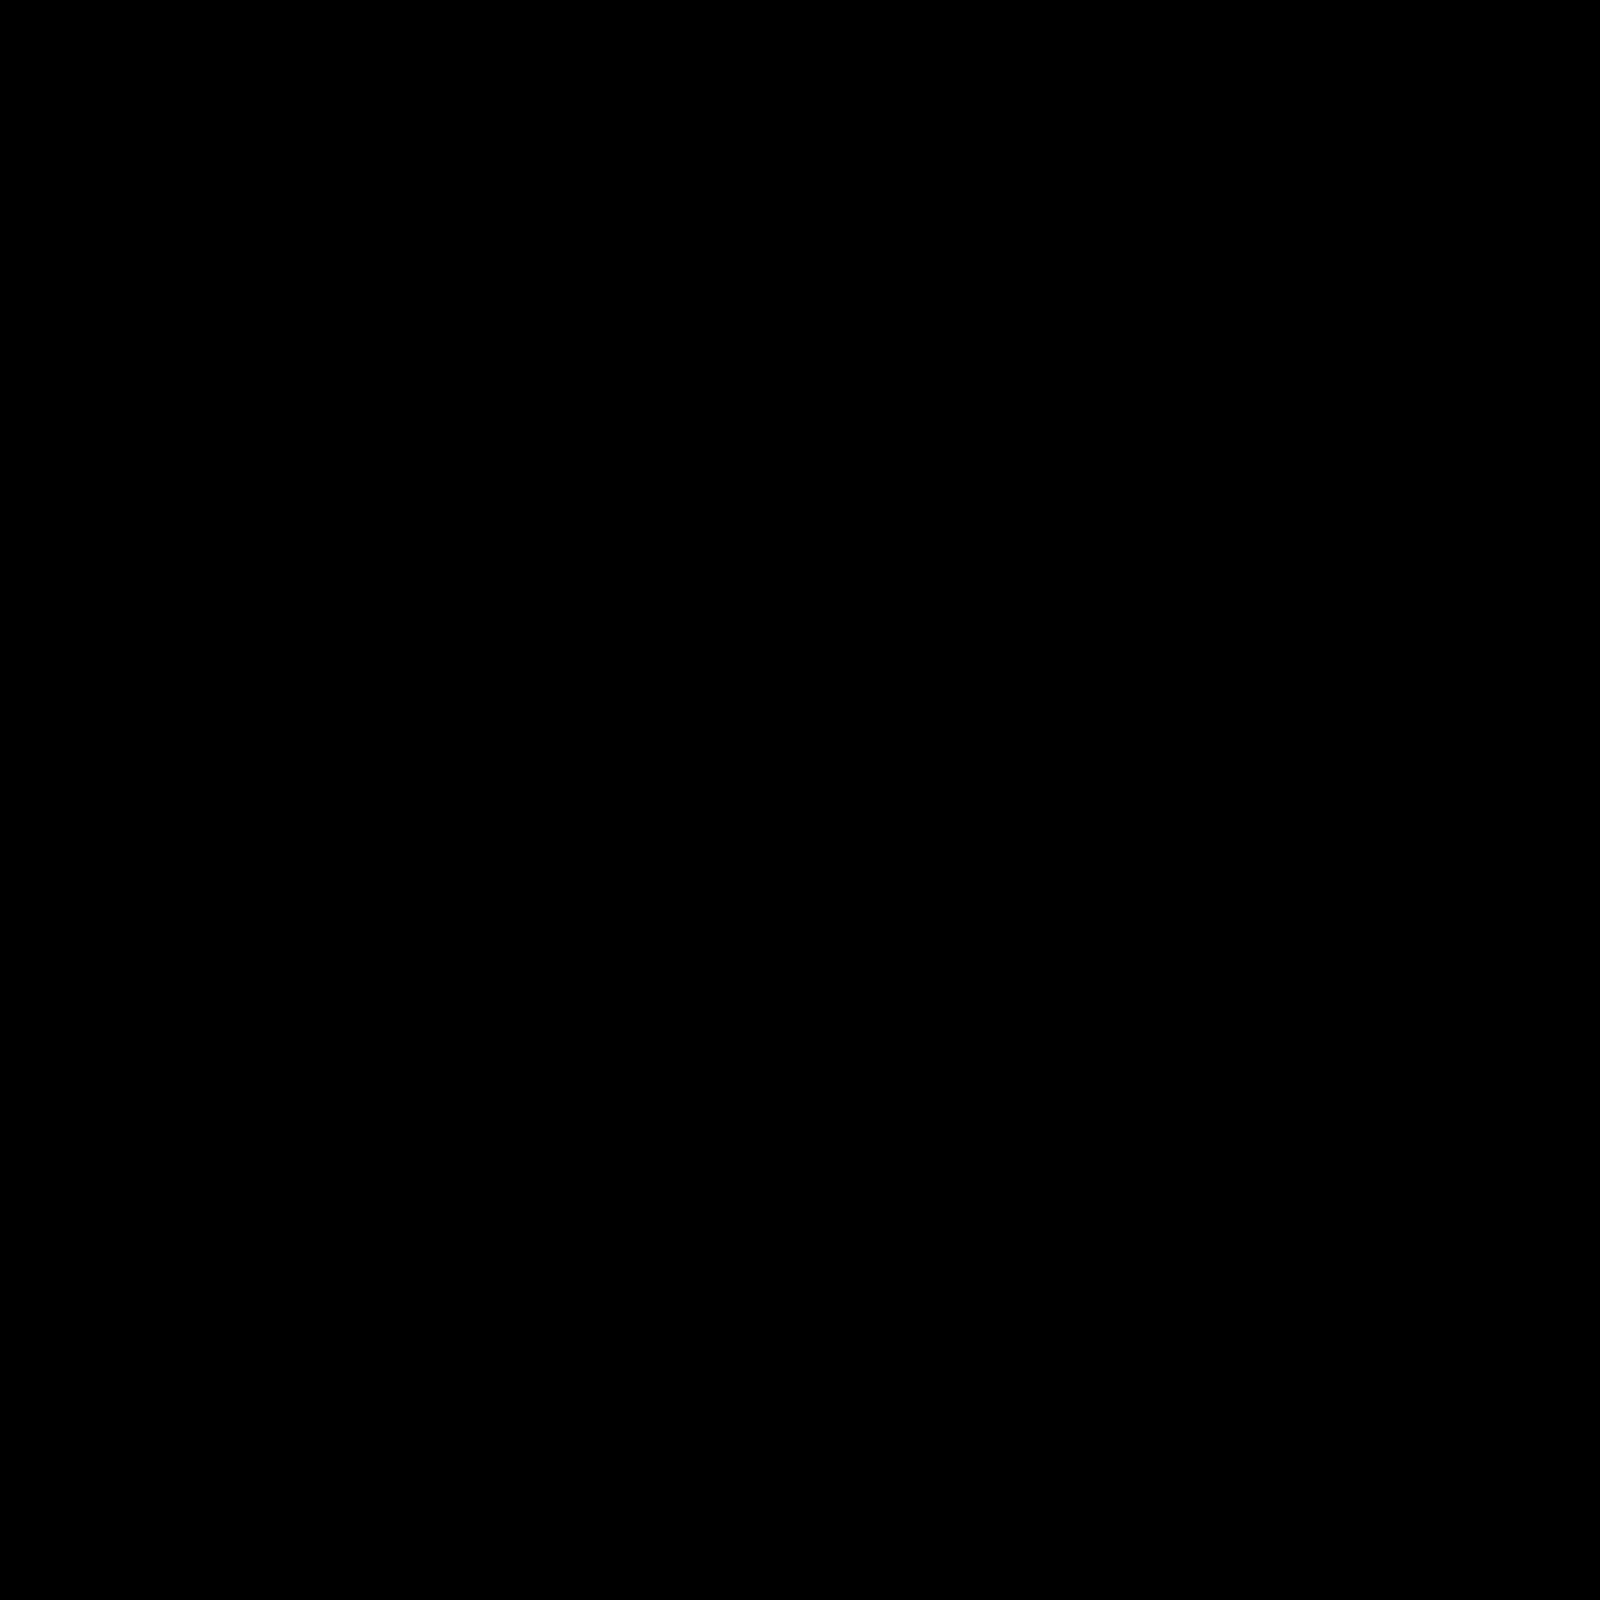 Rectangle icon